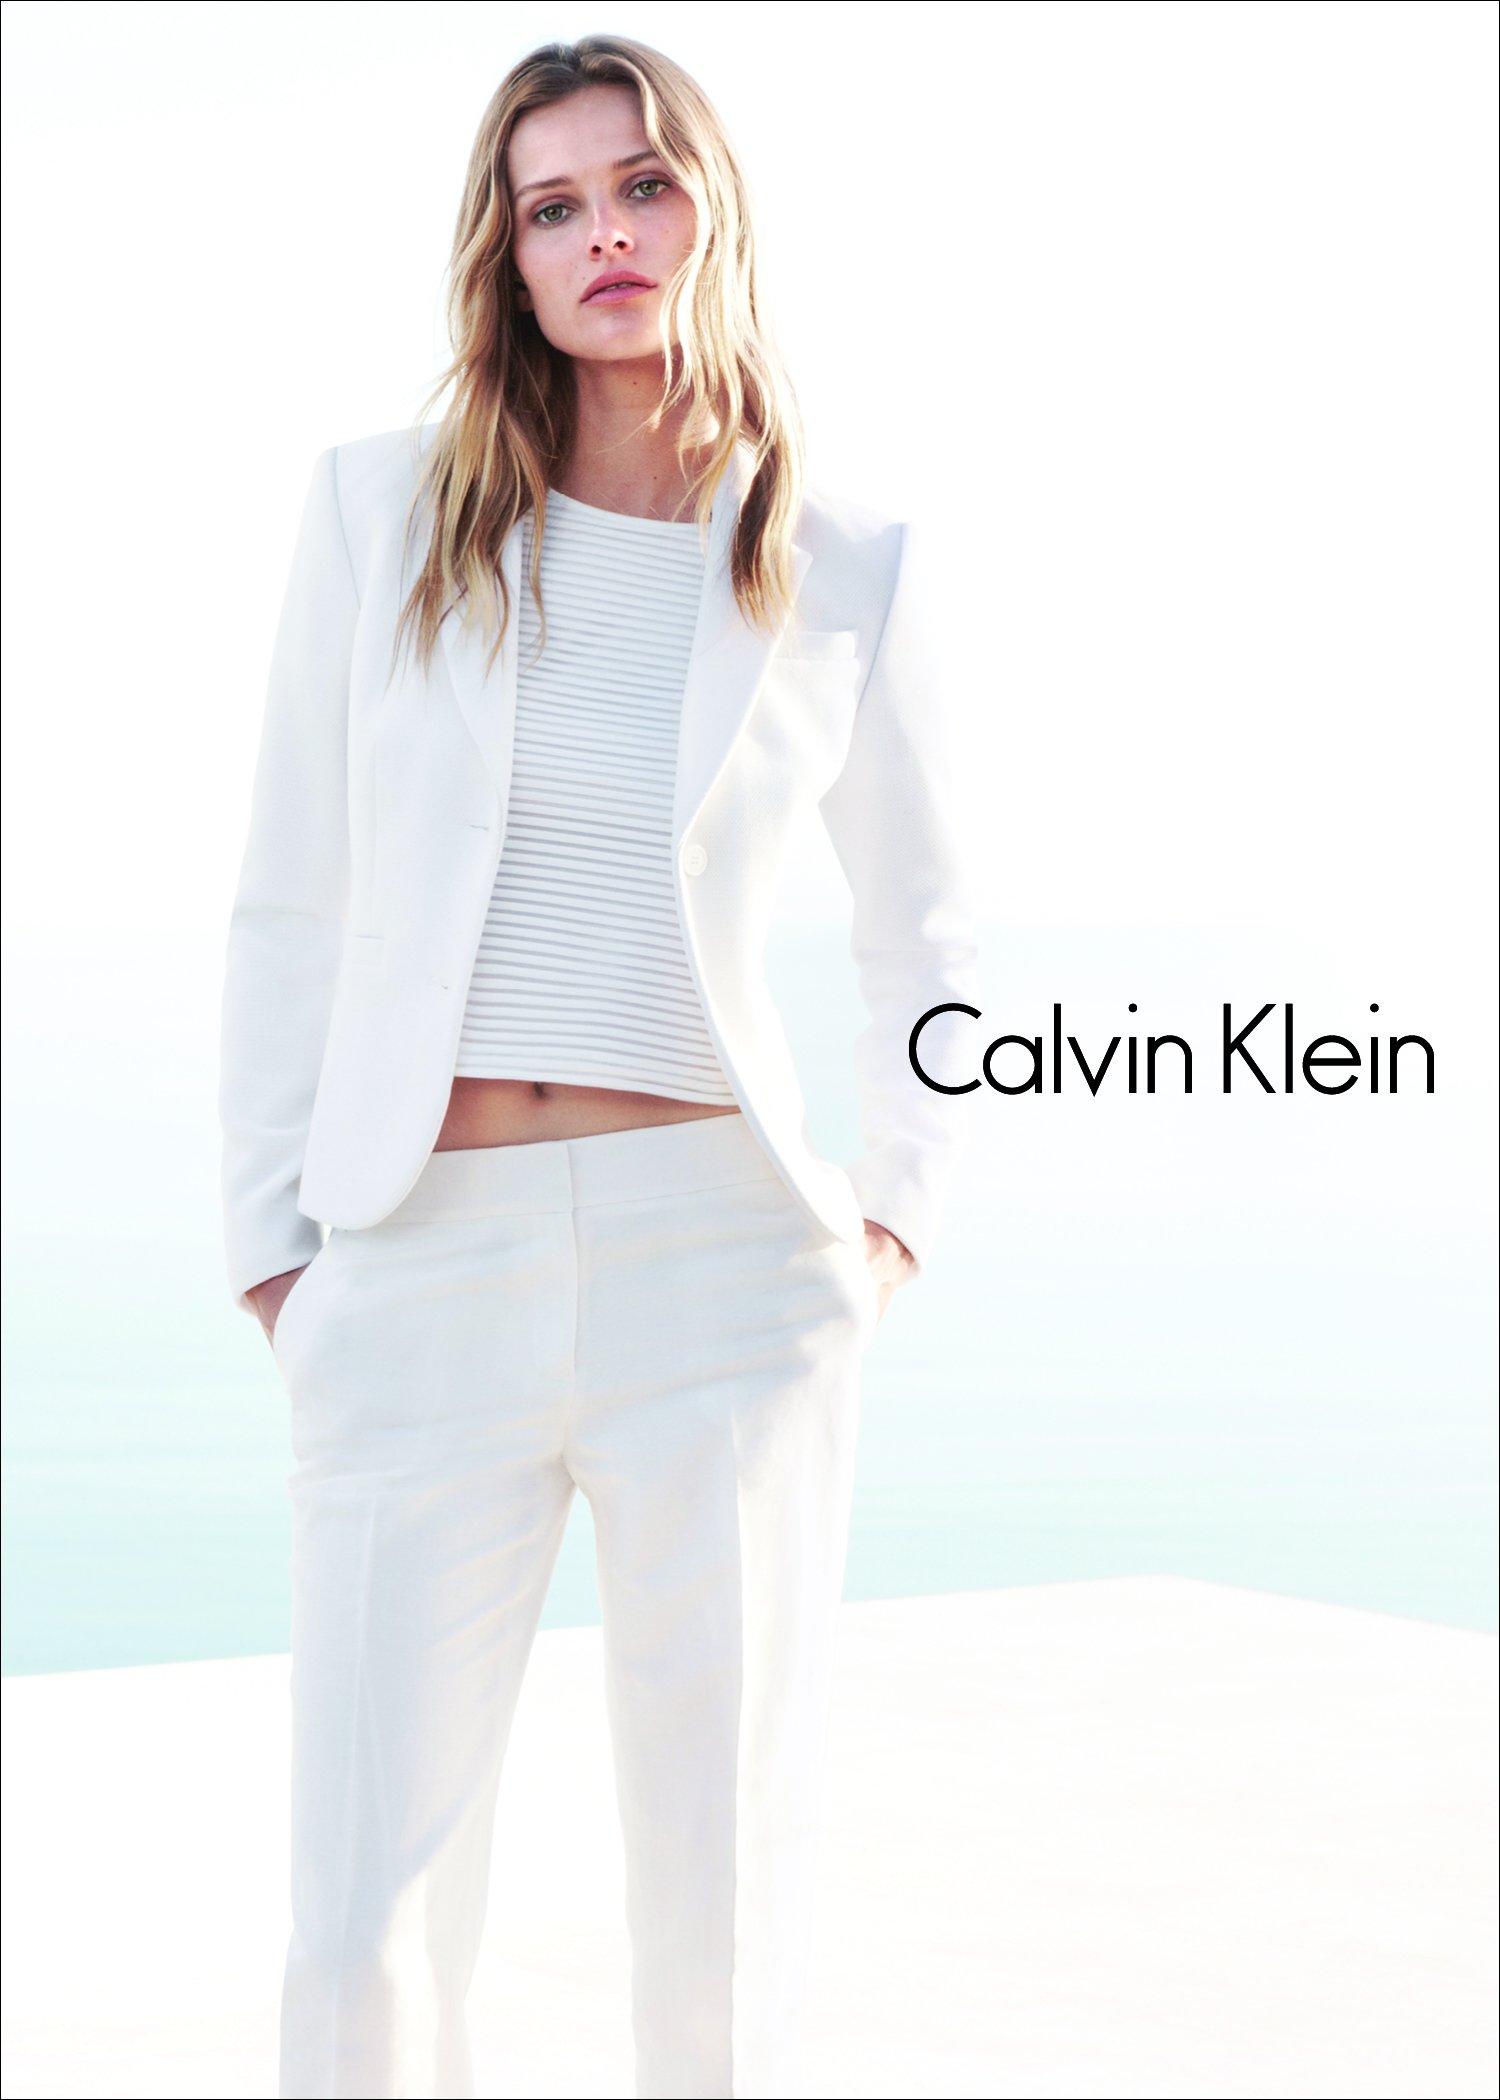 calvin-klein-white-label-s15-w_ph_dan-jackson_sg08